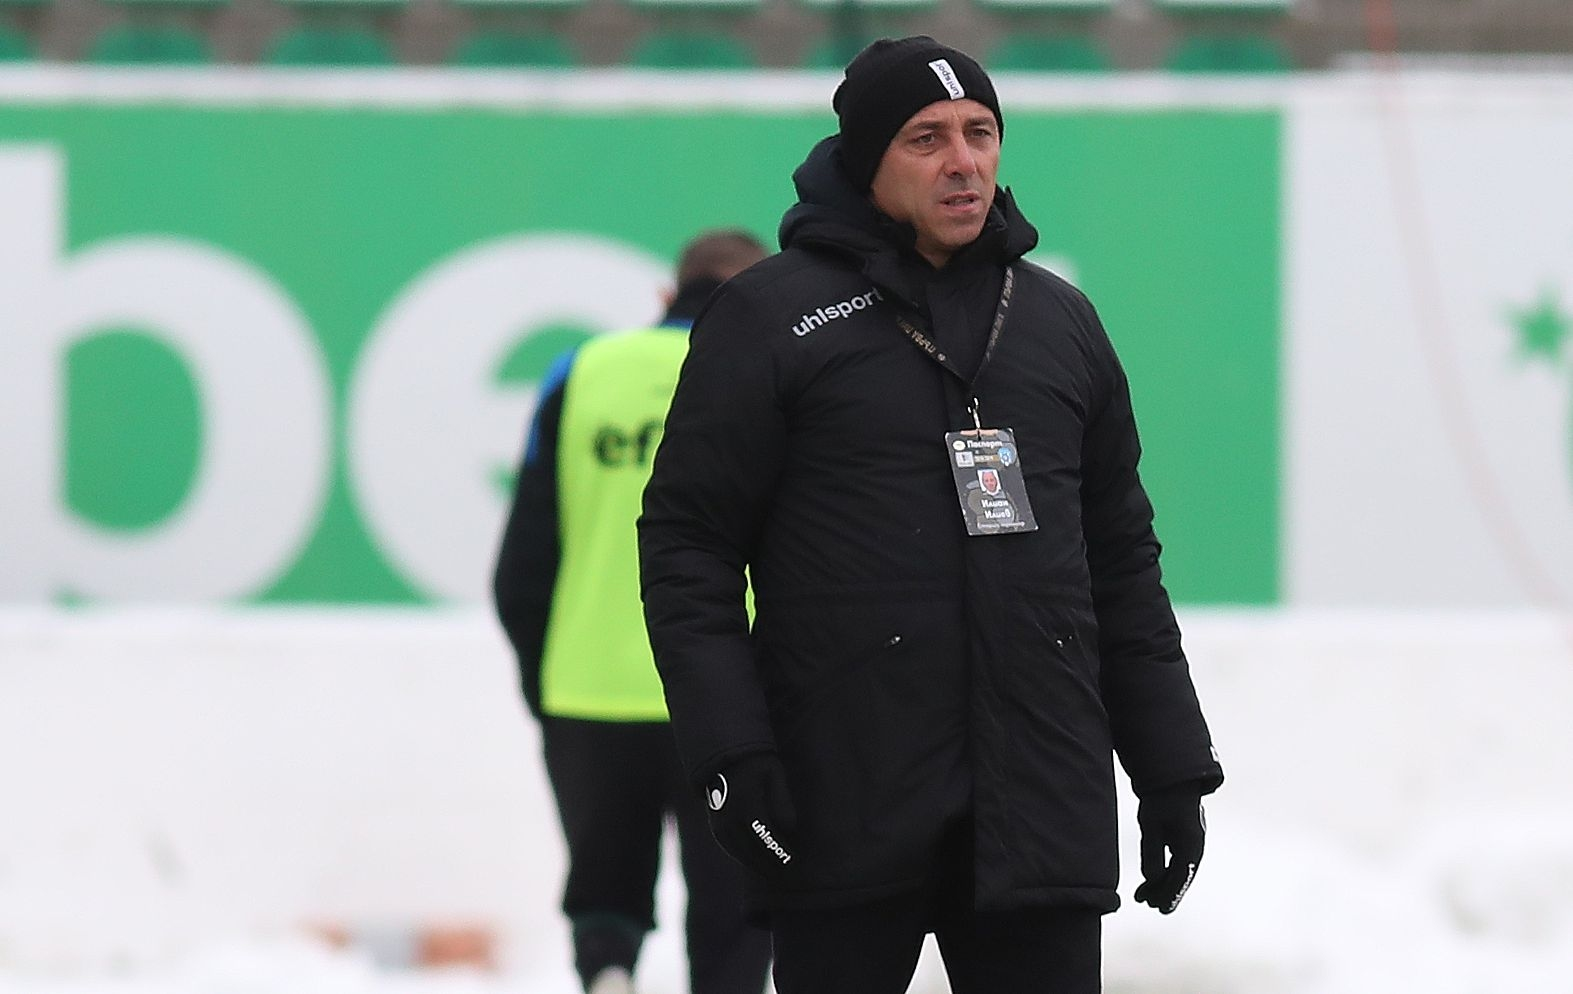 Старши треньорът на Черно море Илиан Илиев заяви, че тръгва